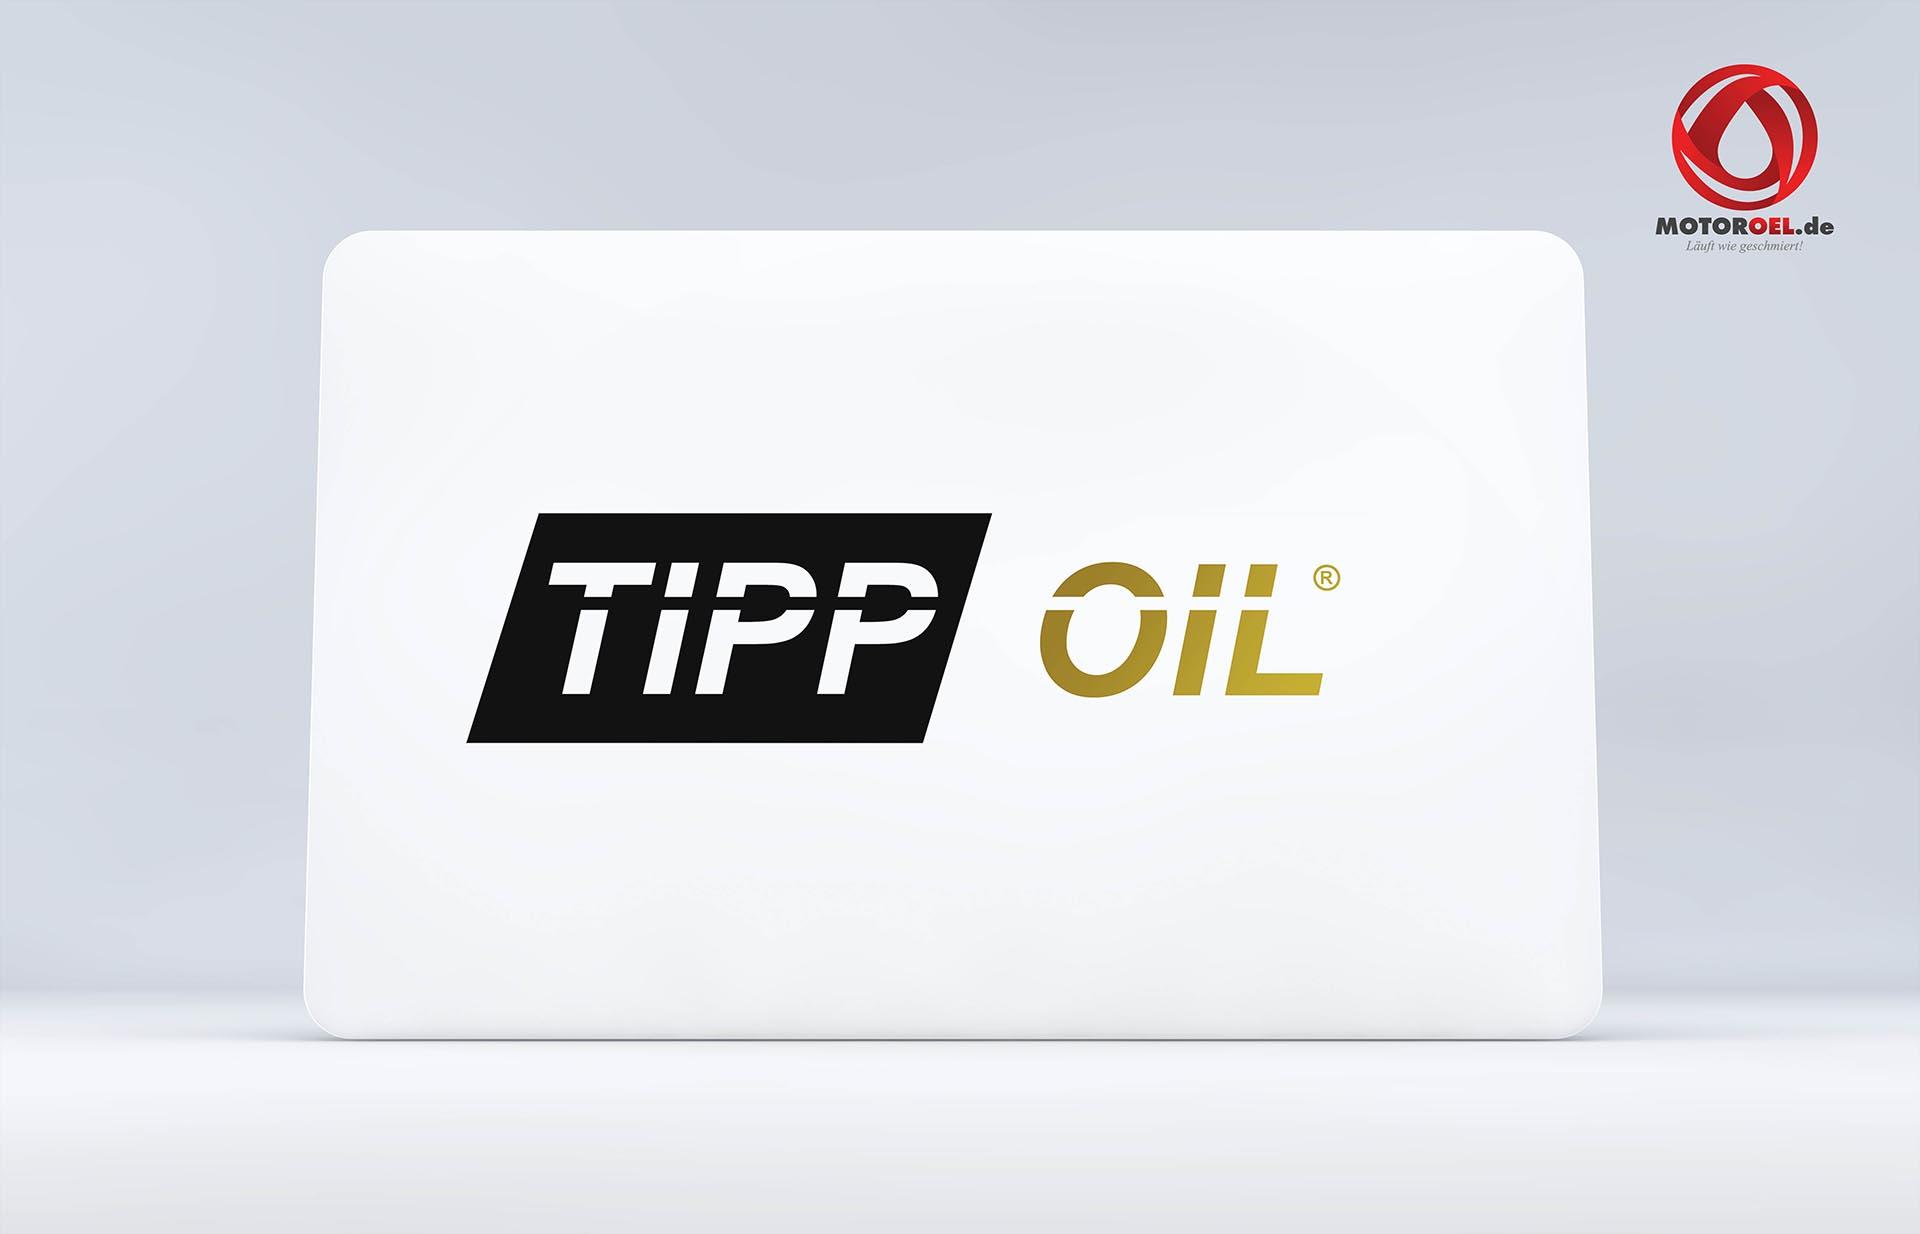 Tipp Oil Pfandsysteme